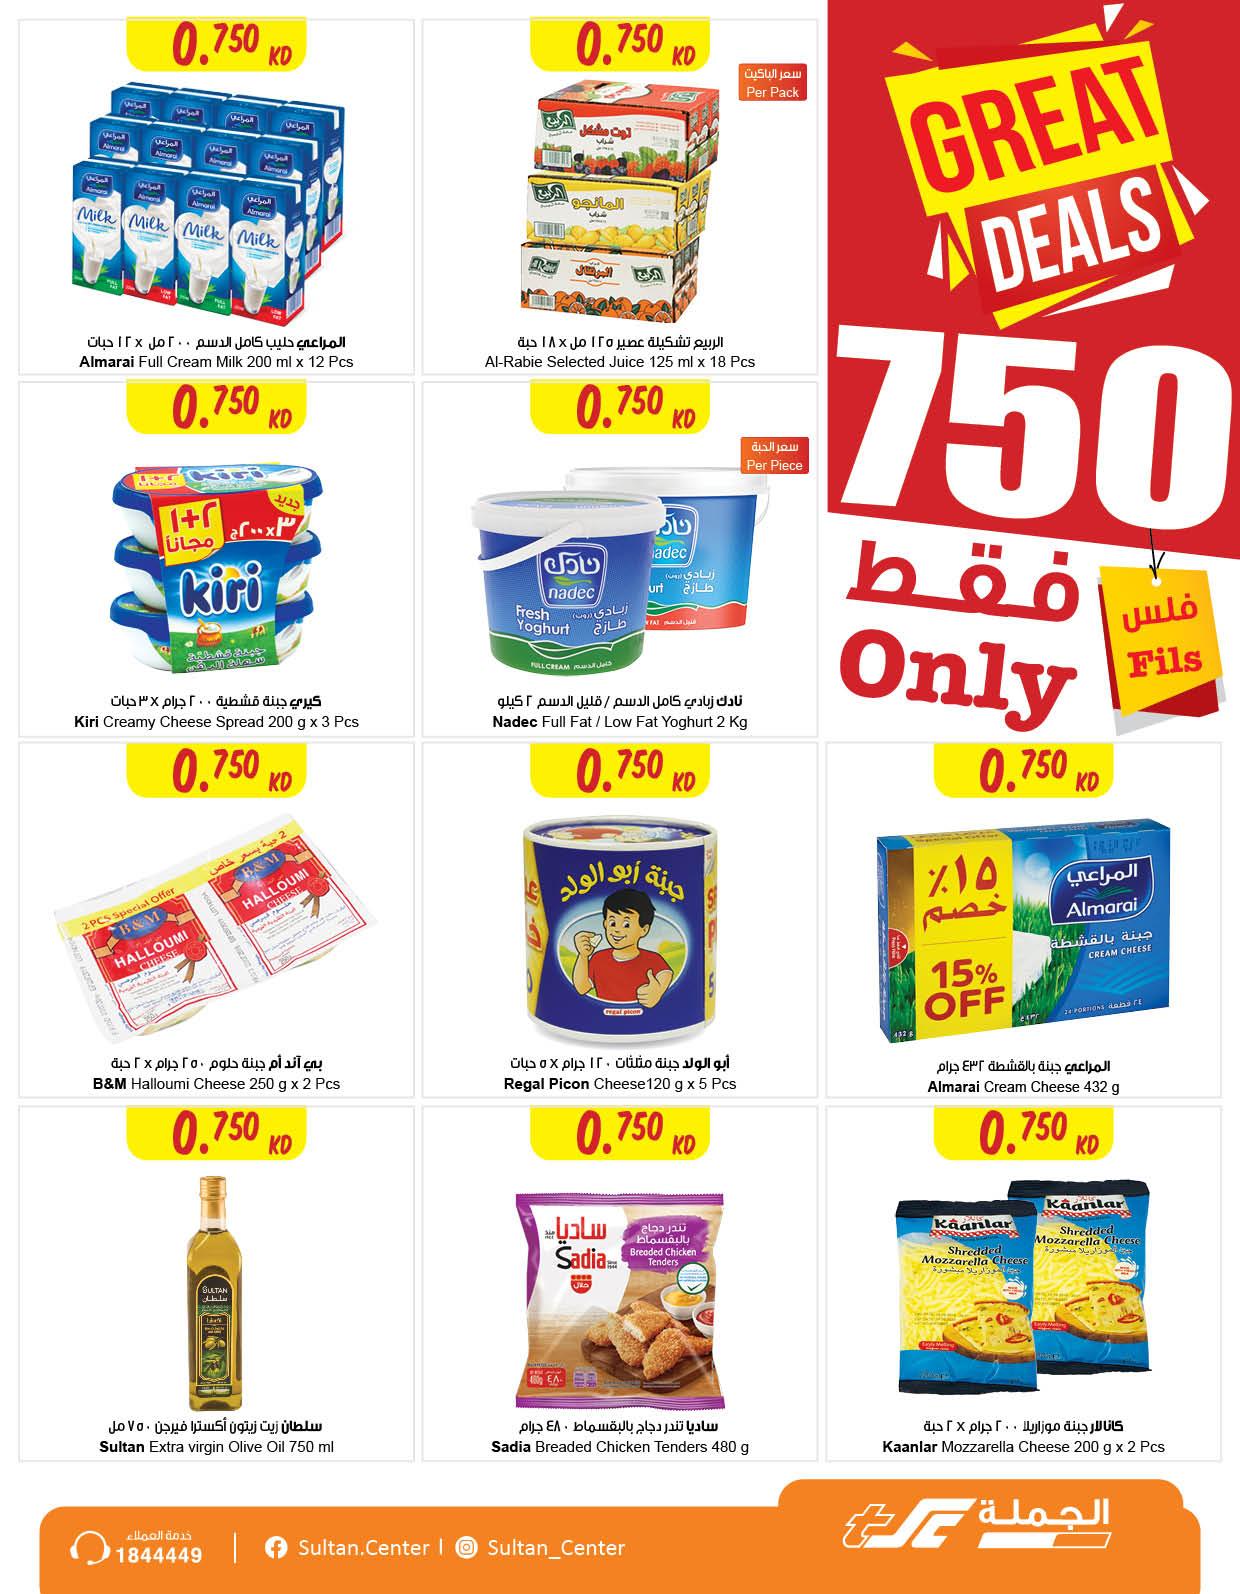 Sultan Center Weekly promotions, iiQ8, Deals in Sultan Centre Kuwait Jan 2021 2